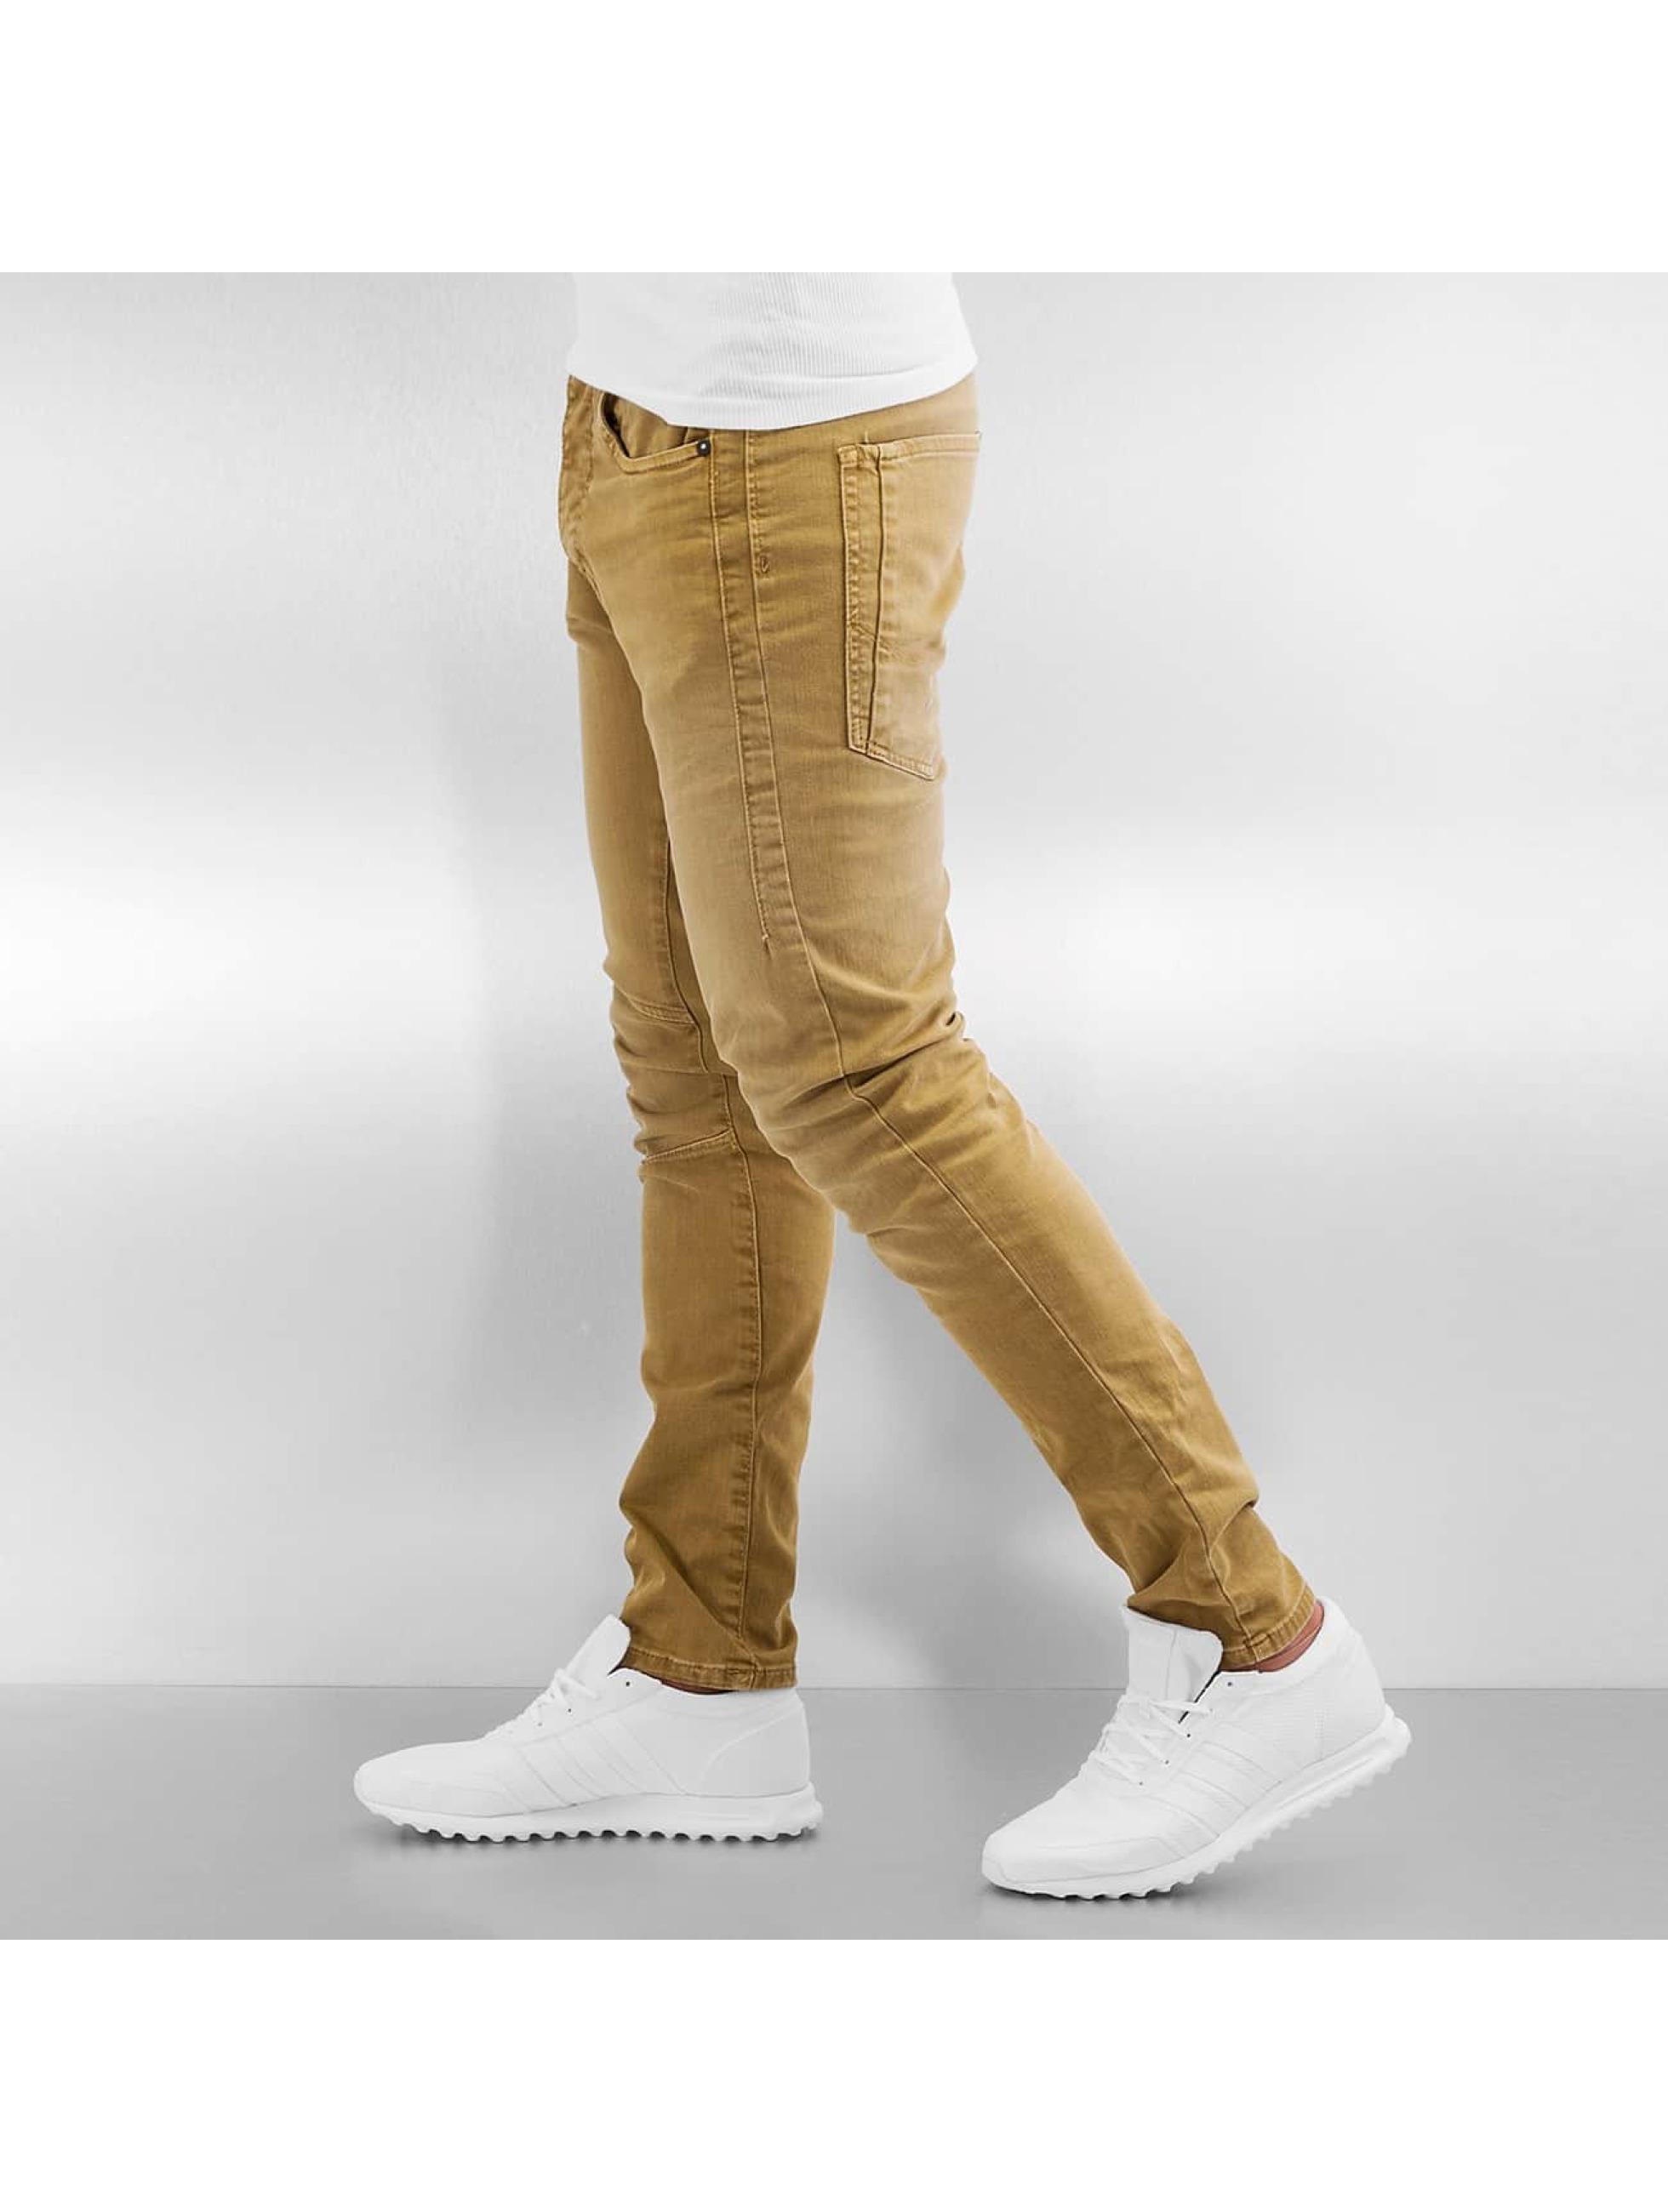 Jack & Jones Slim Fit Jeans jjIluke jjEcho JOS 999 коричневый